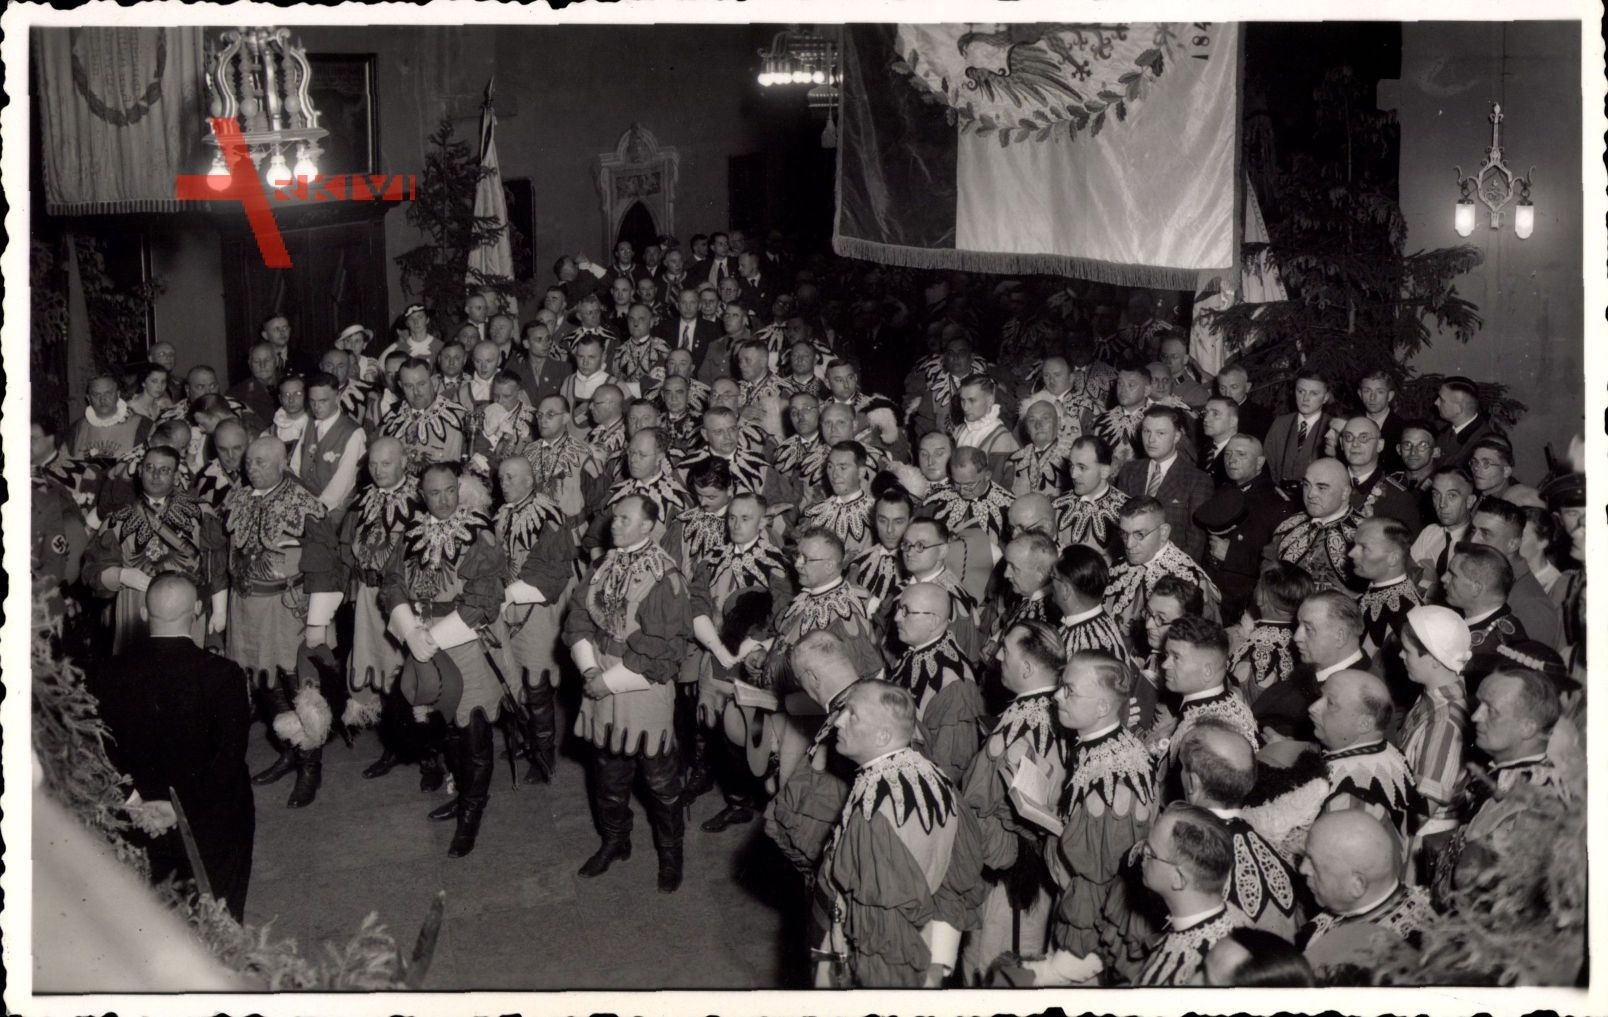 Mühlhausen im Thüringer Unstrut Hainich Kreis, Feier der Pankgrafen, Karneval